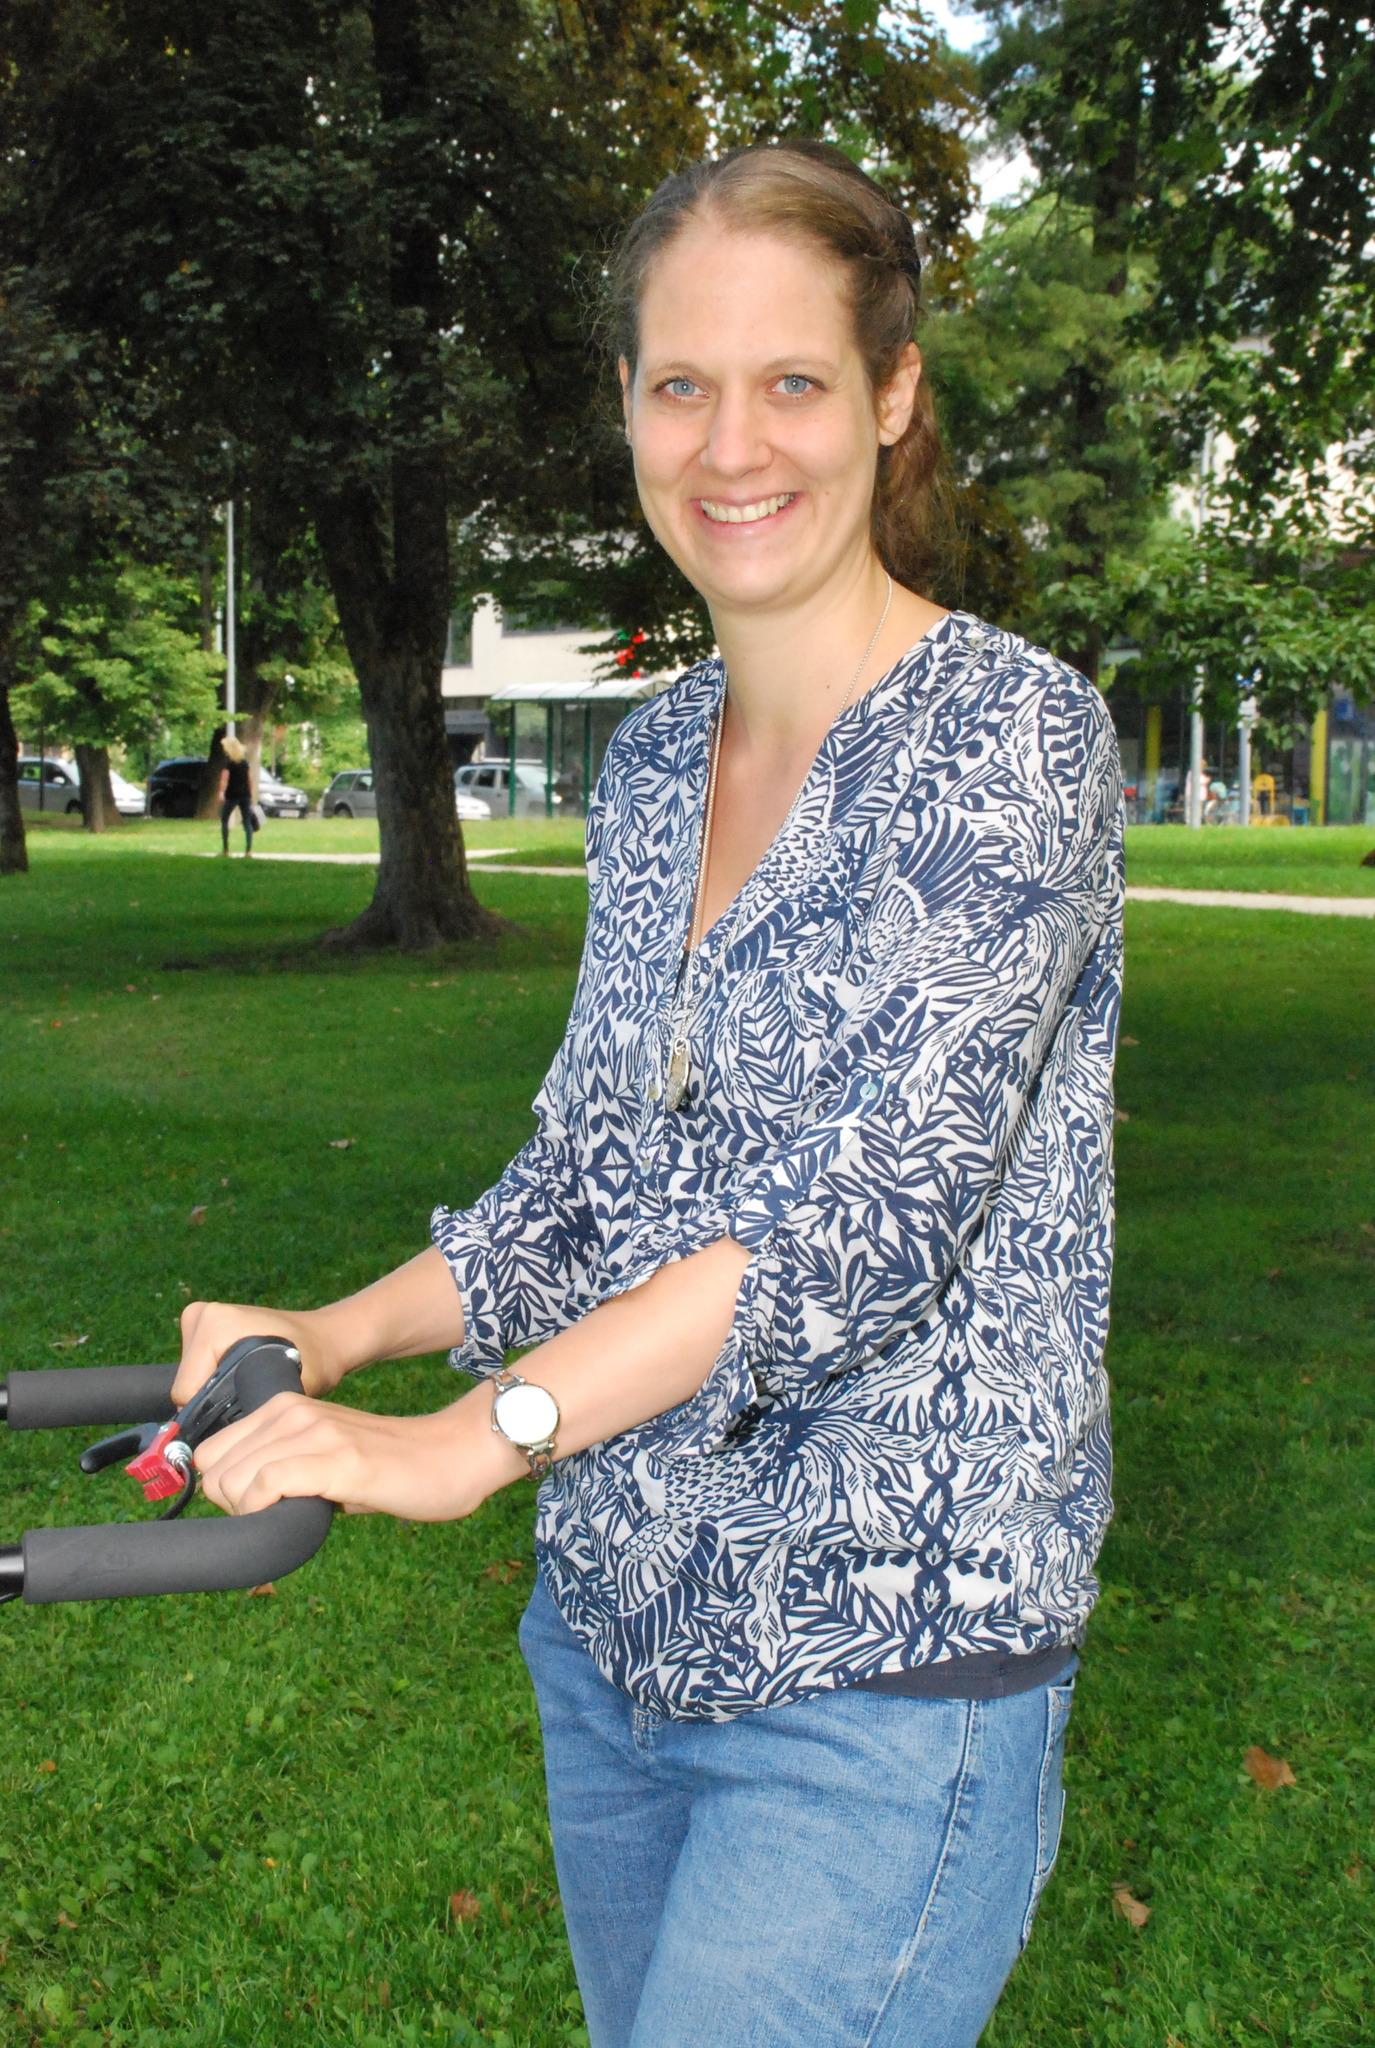 Linz Uni Leute Kennenlernen Singlespeed Fahrrad In Gsting